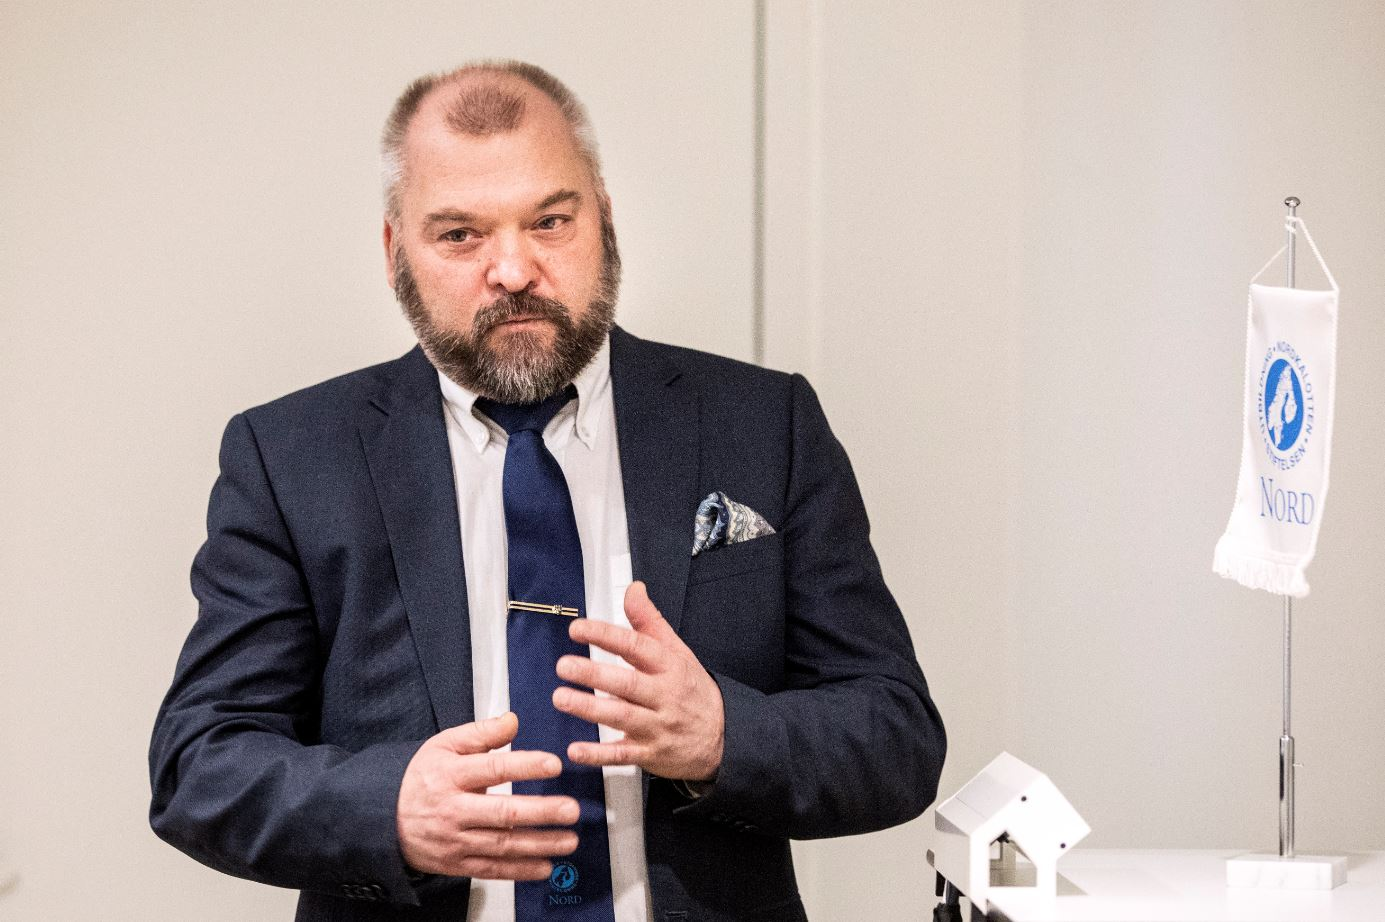 Foto: Ninni Andersson, Regeringskansliet